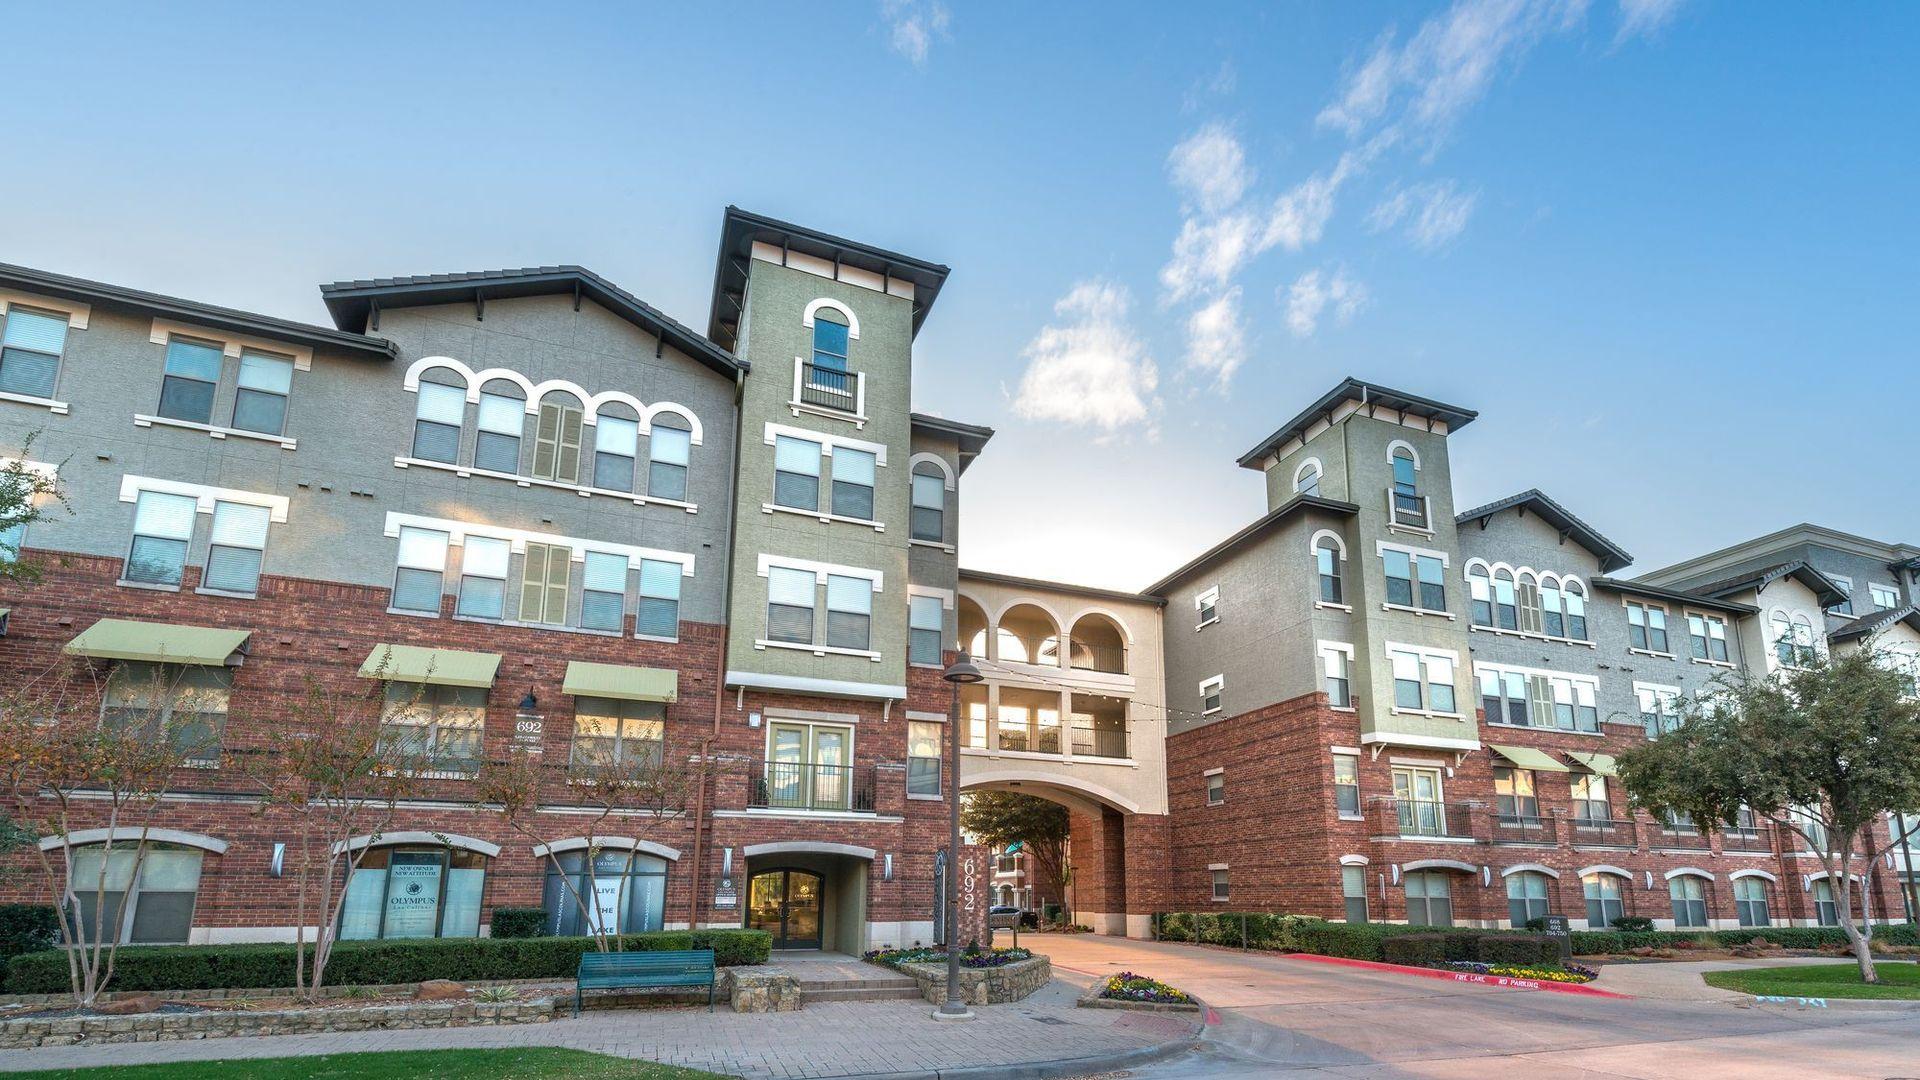 2 bedroom apartment at Las Colinas Boulevard, Irving, TX ...